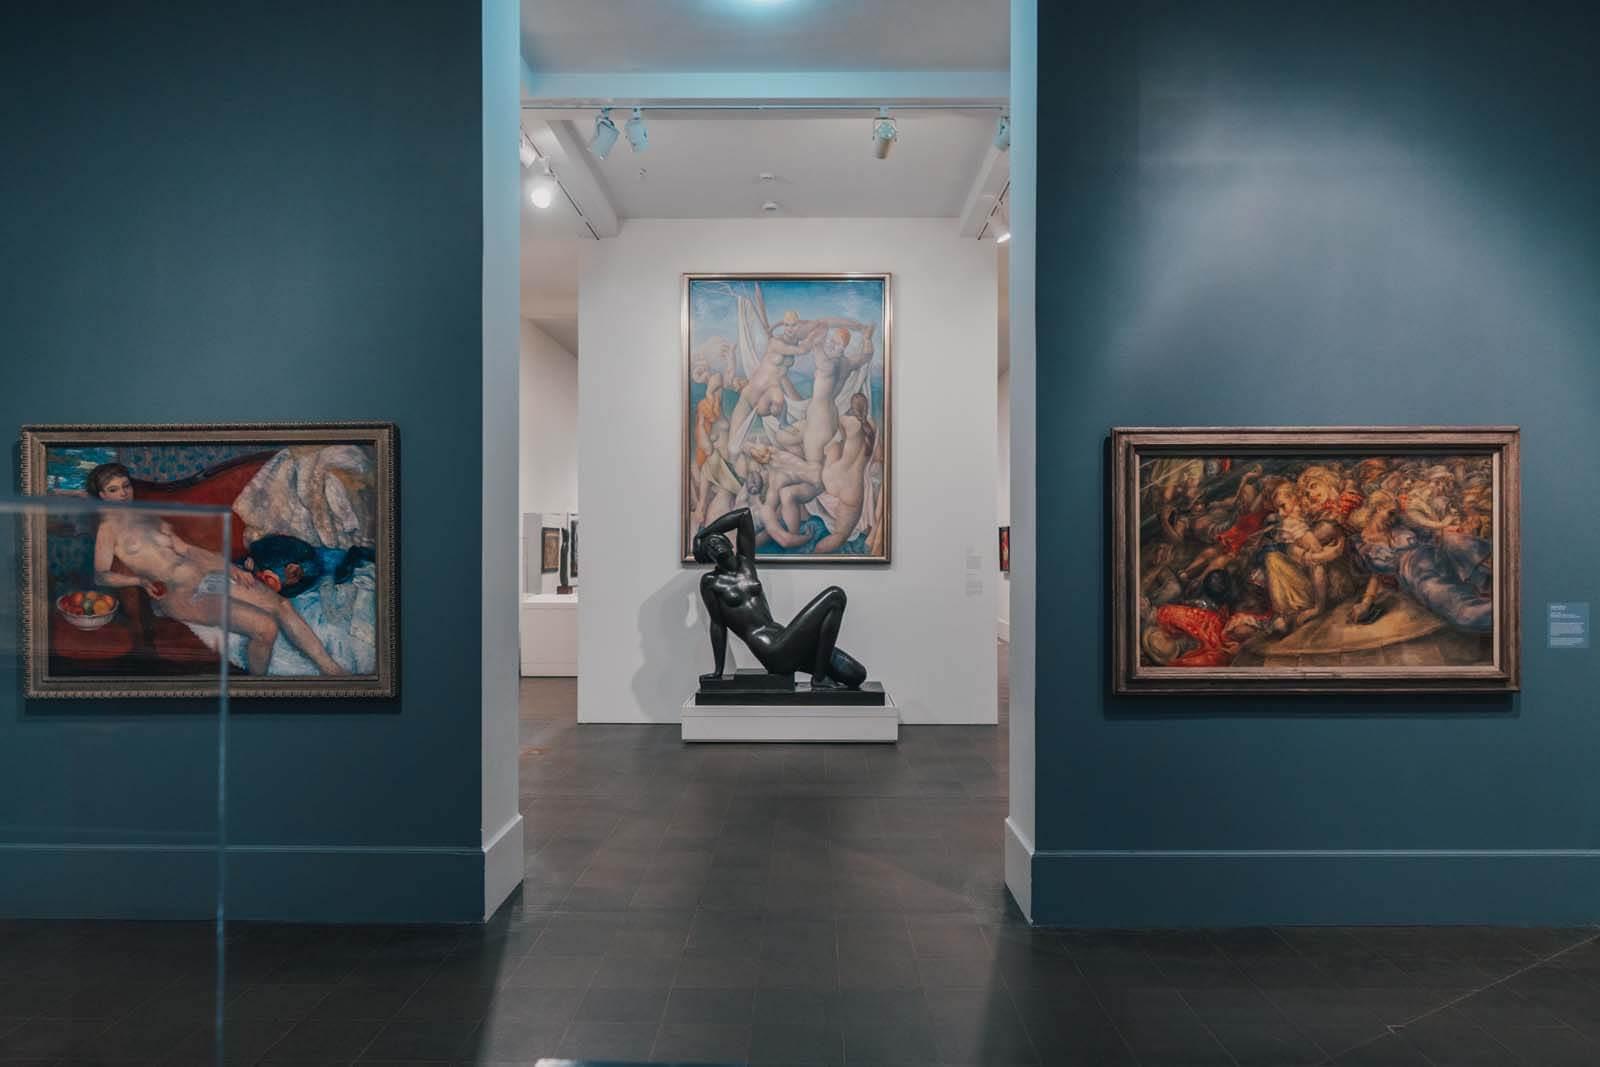 gallery inside the Brooklyn Museum